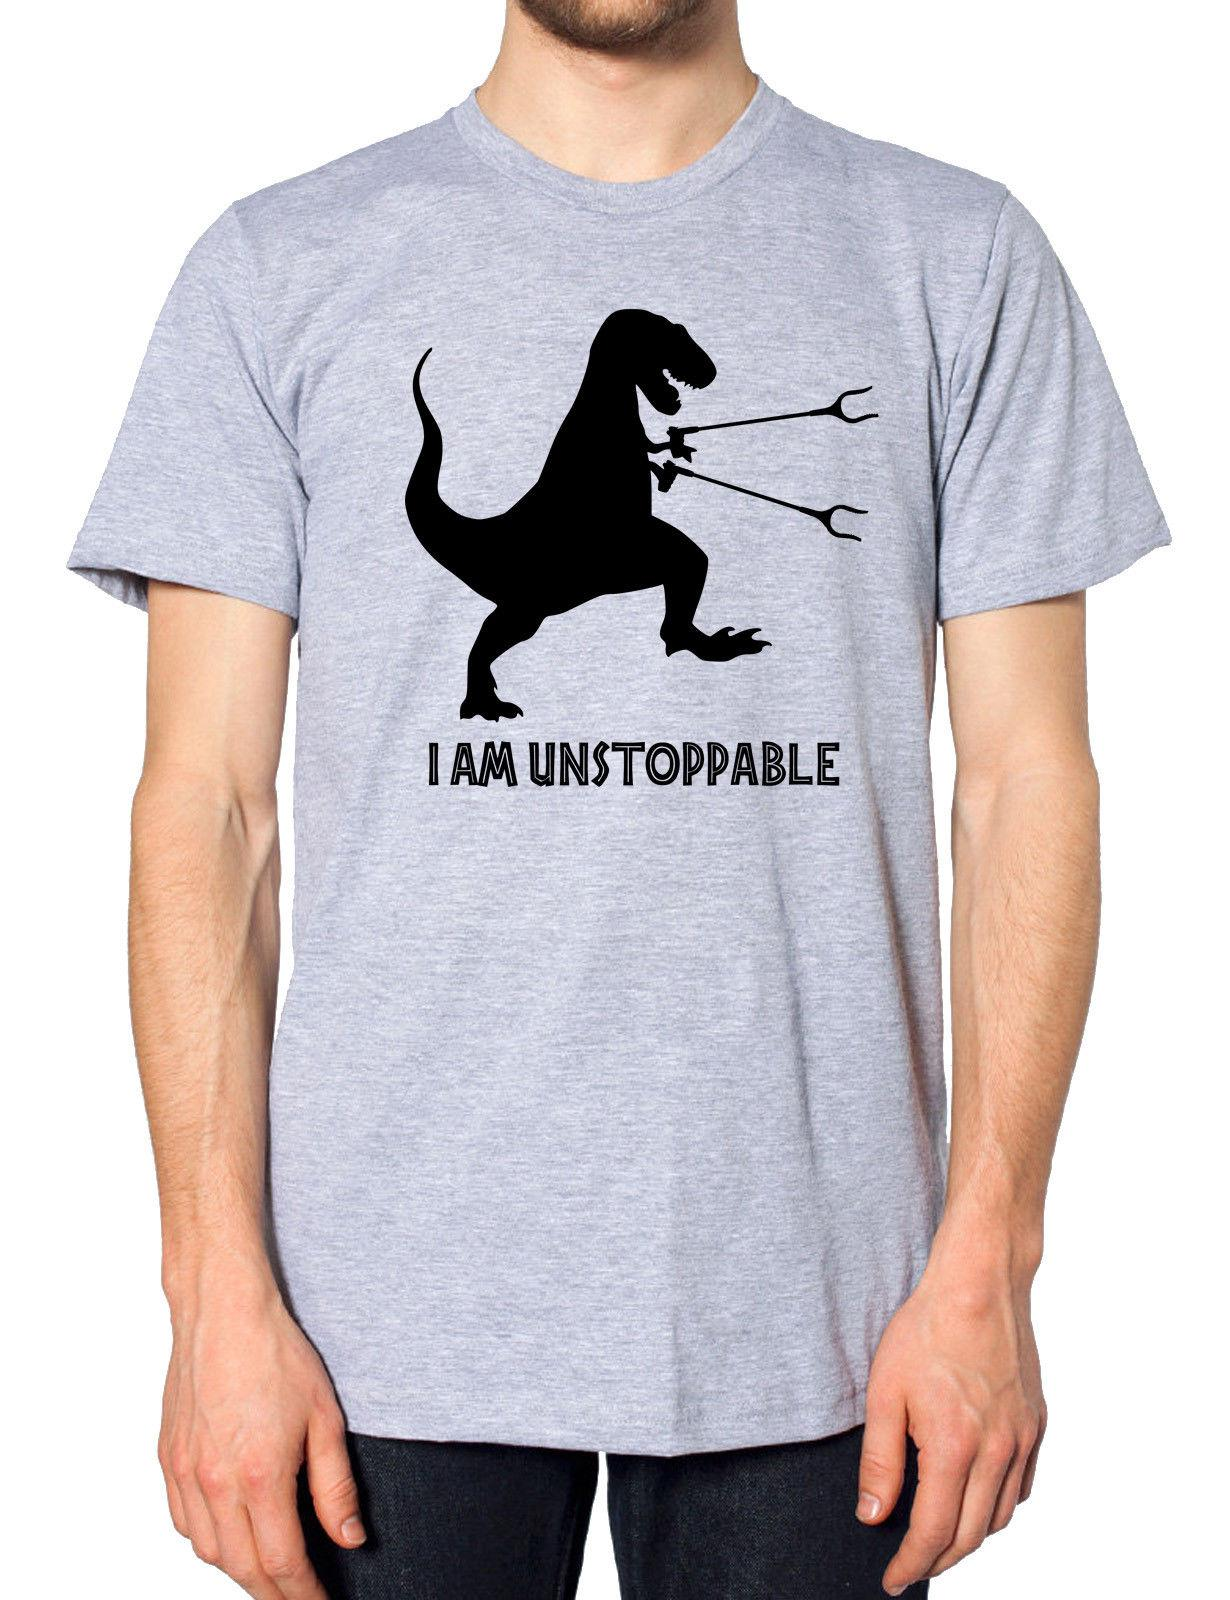 aa80048b I Am Unstoppable T Rex T Shirt Tee Men Dinosaur Boy Gift Funny Tshirt Top  J8 Brand Shirts Jeans Print Online Buy T Shirt Best T Shirt Shop Online  From ...